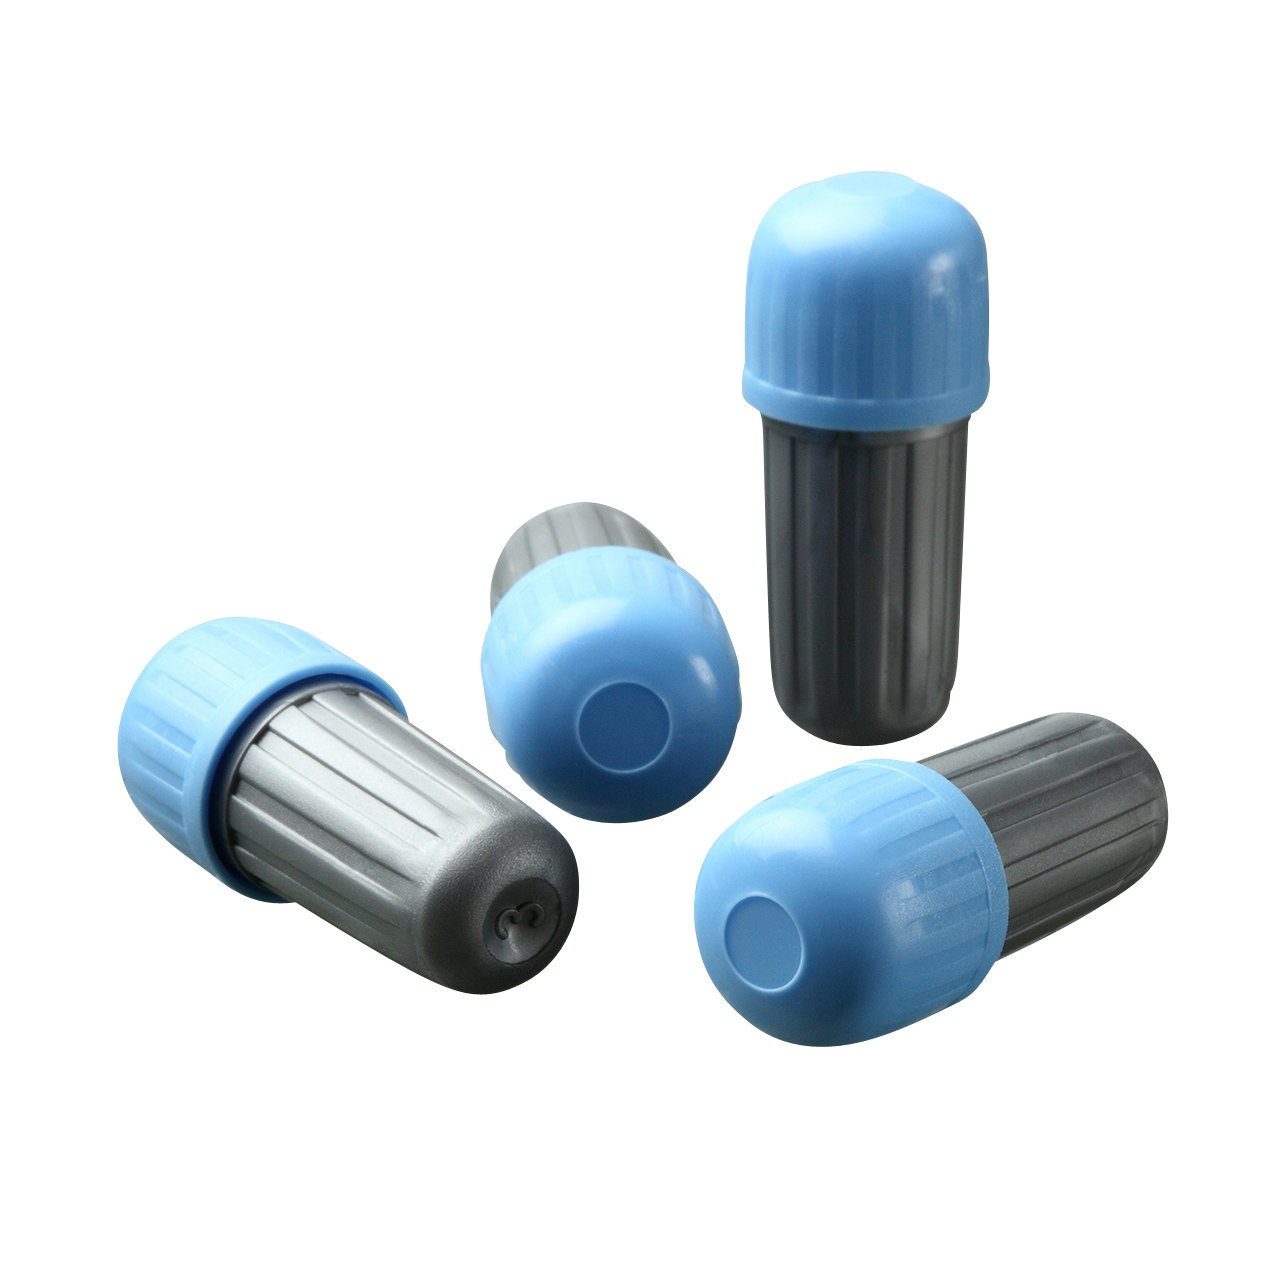 Spherodon Plus-amalgam-alloy-Silmet-Dental Supplies